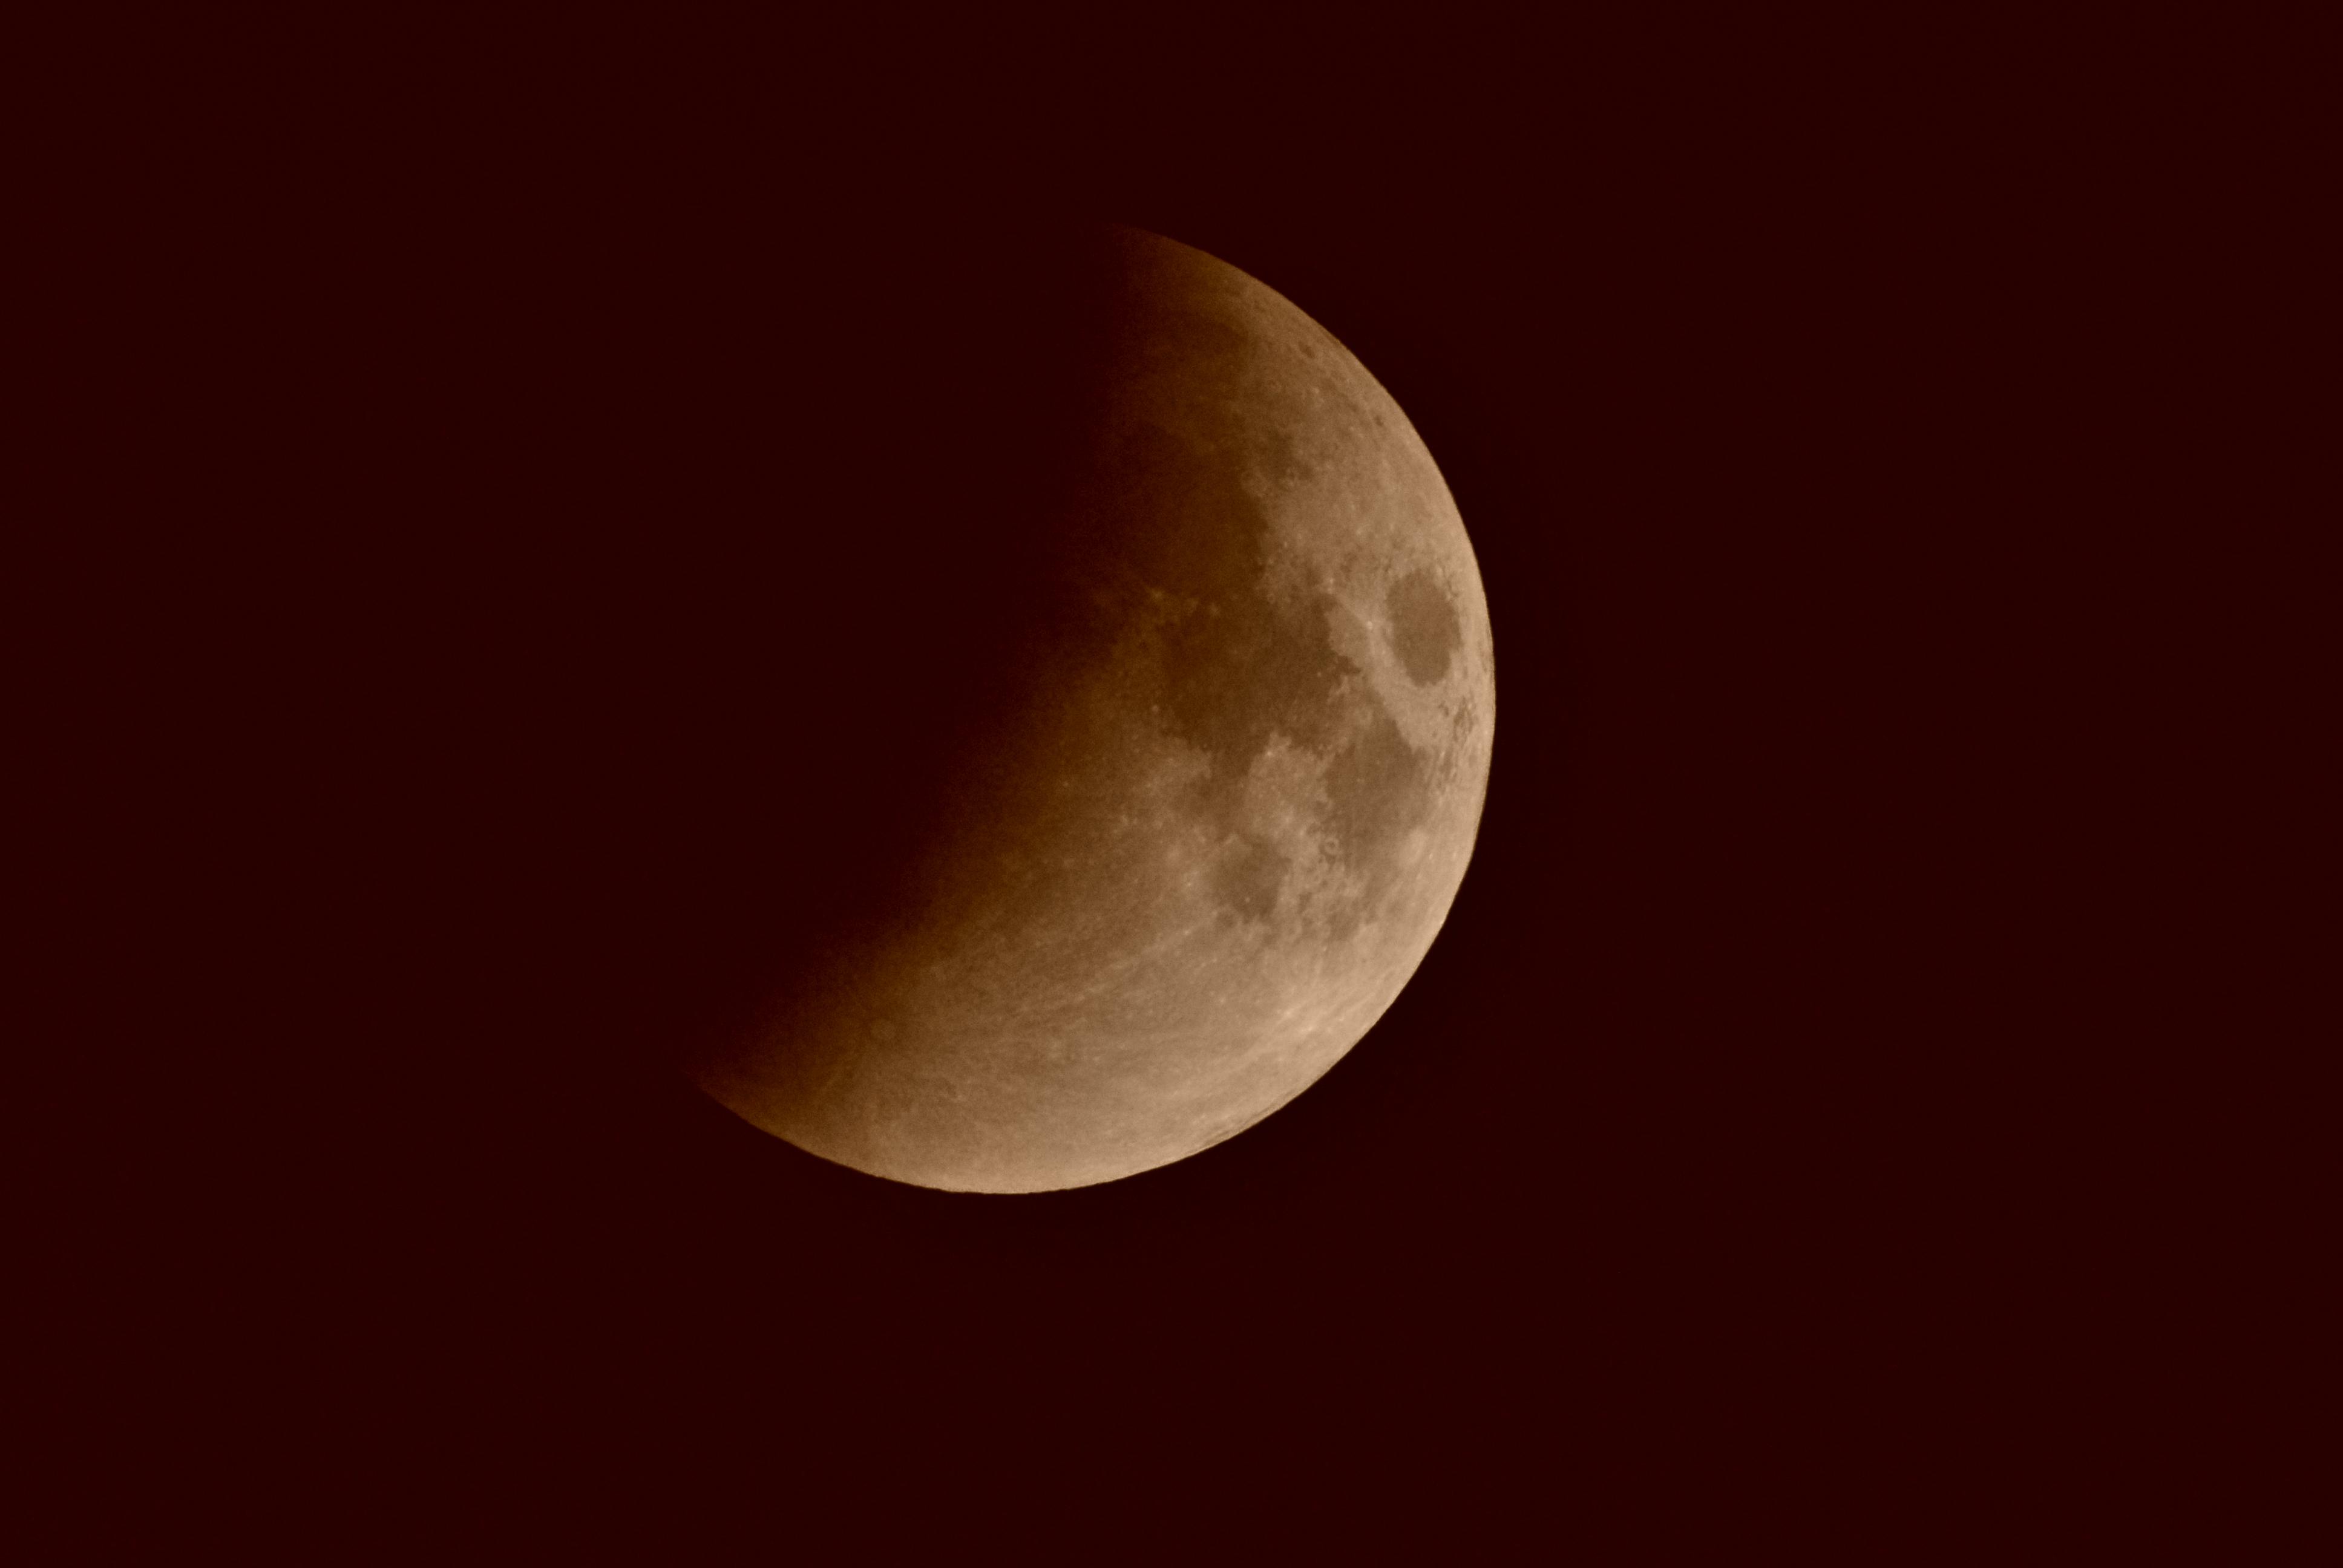 Mondfinsternis - halbe Bedeckung